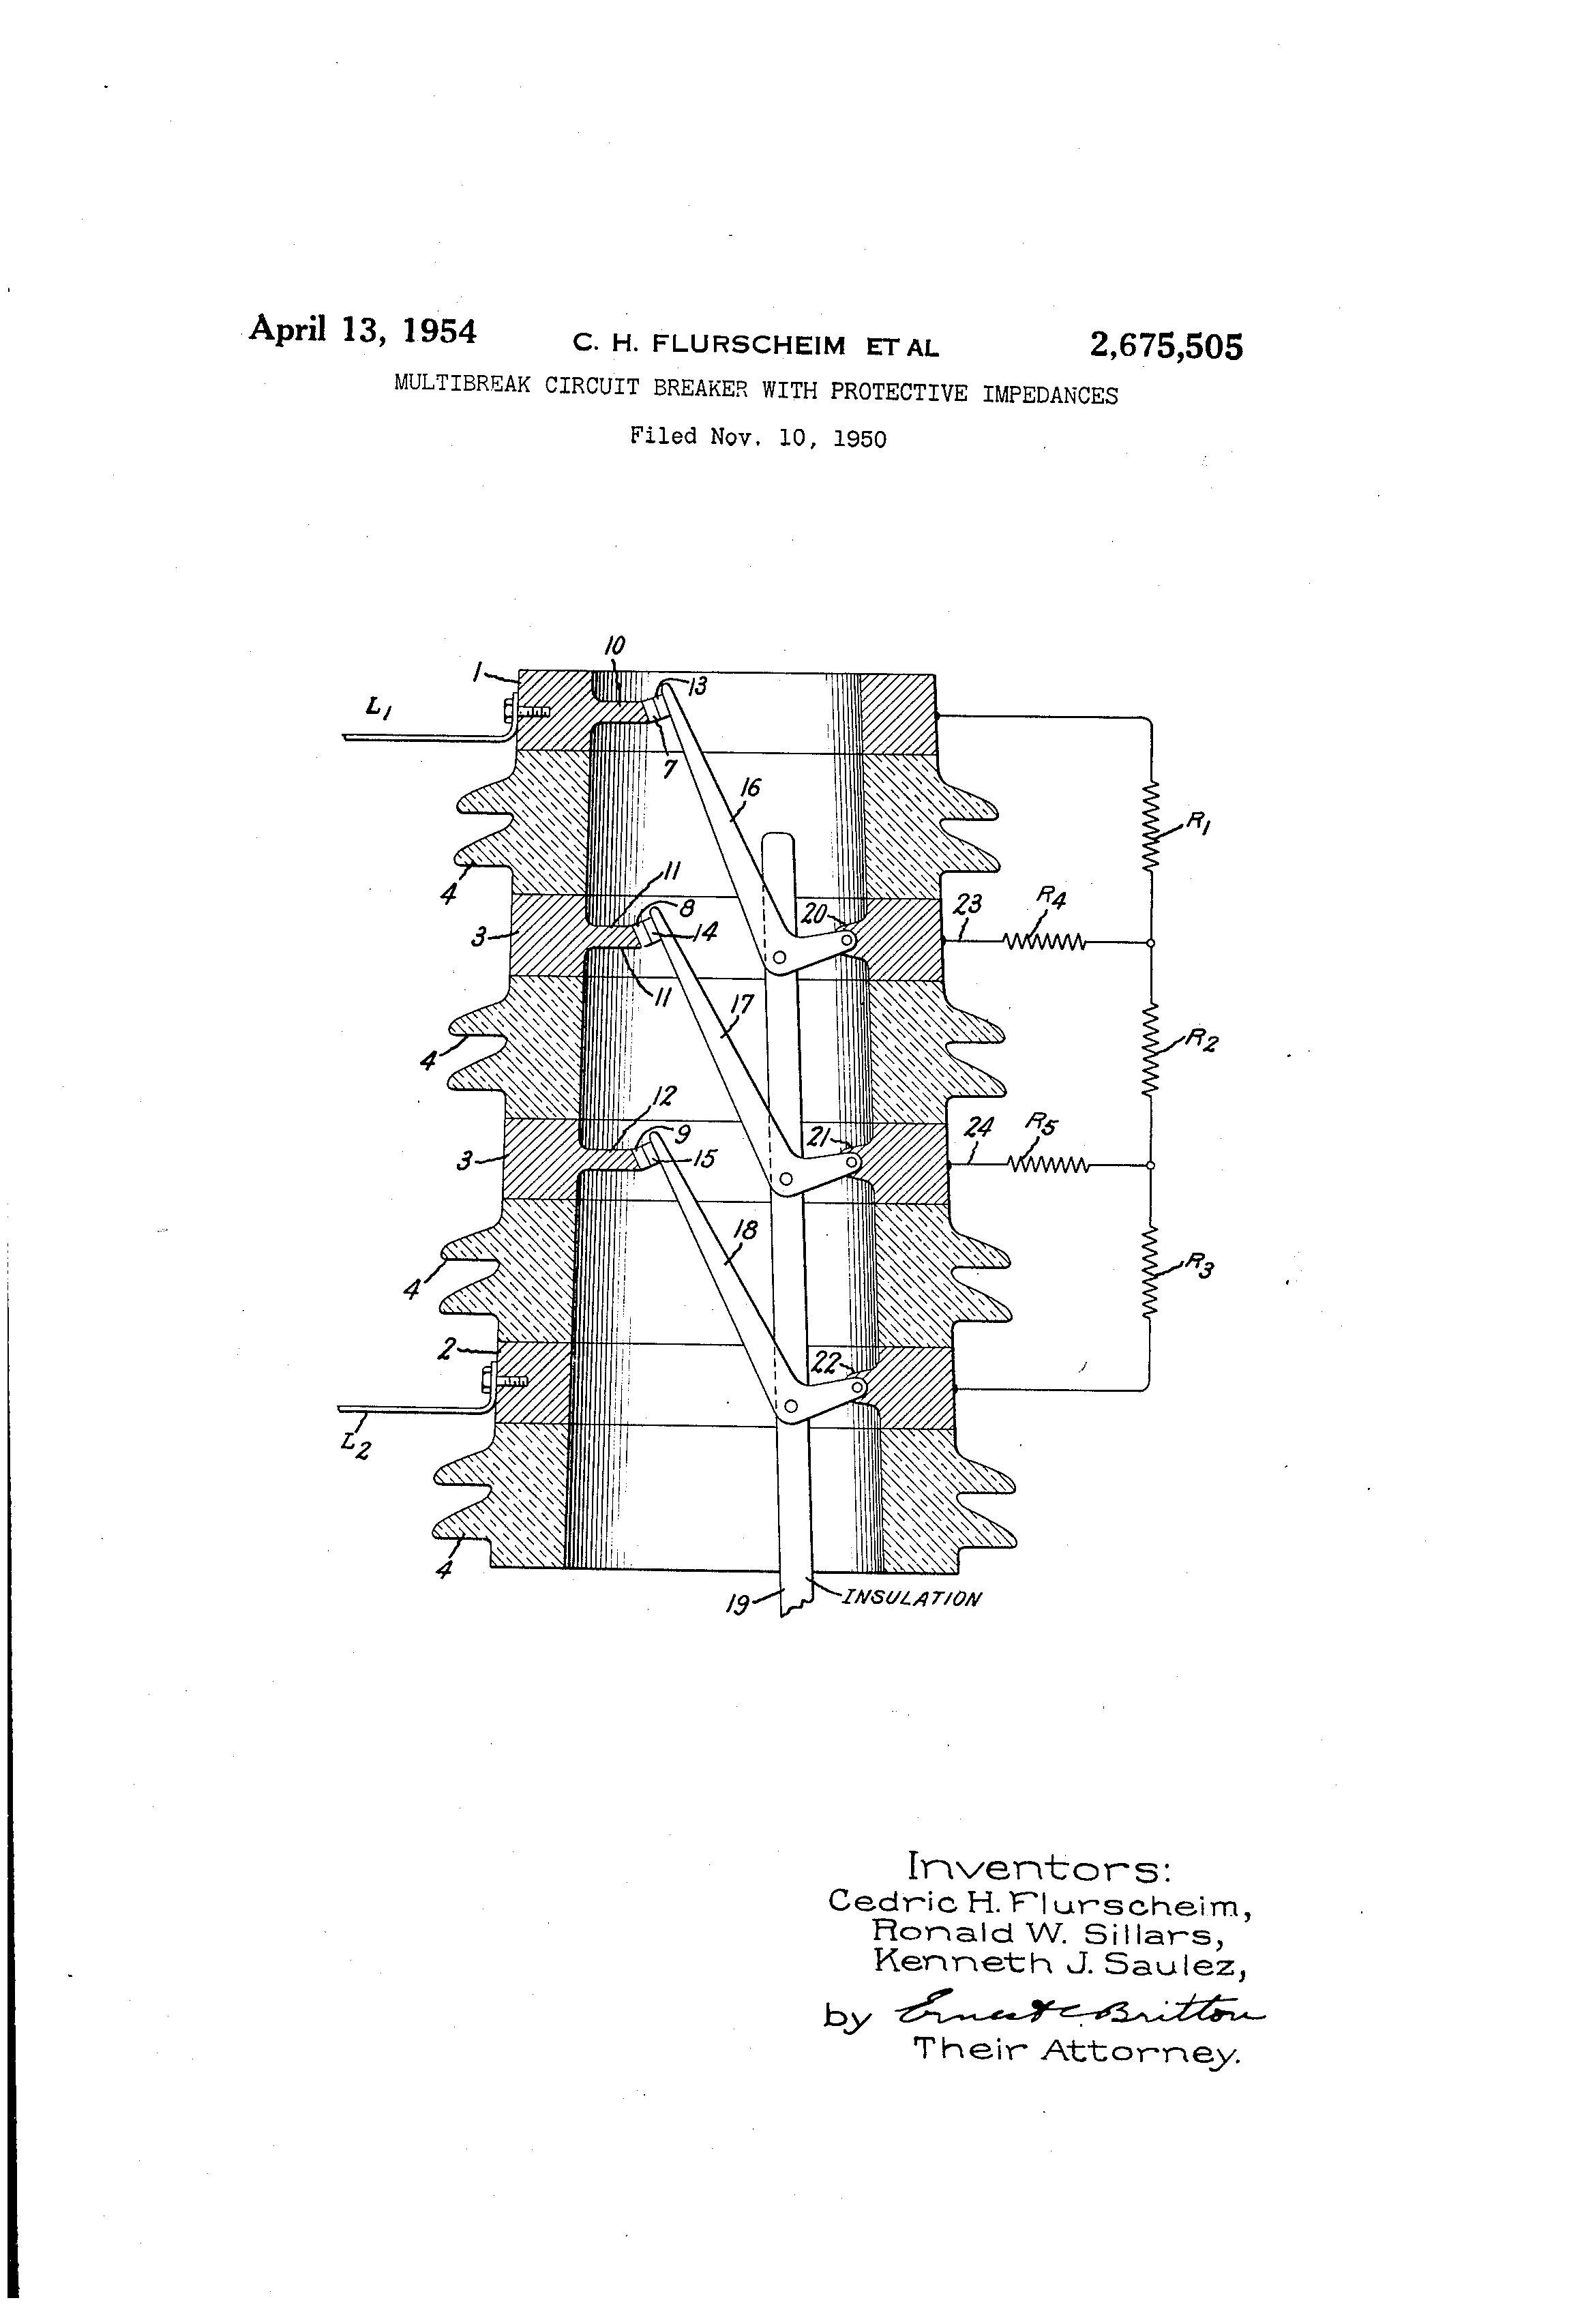 patent us2675505 - multibreak circuit breaker with protective impedances